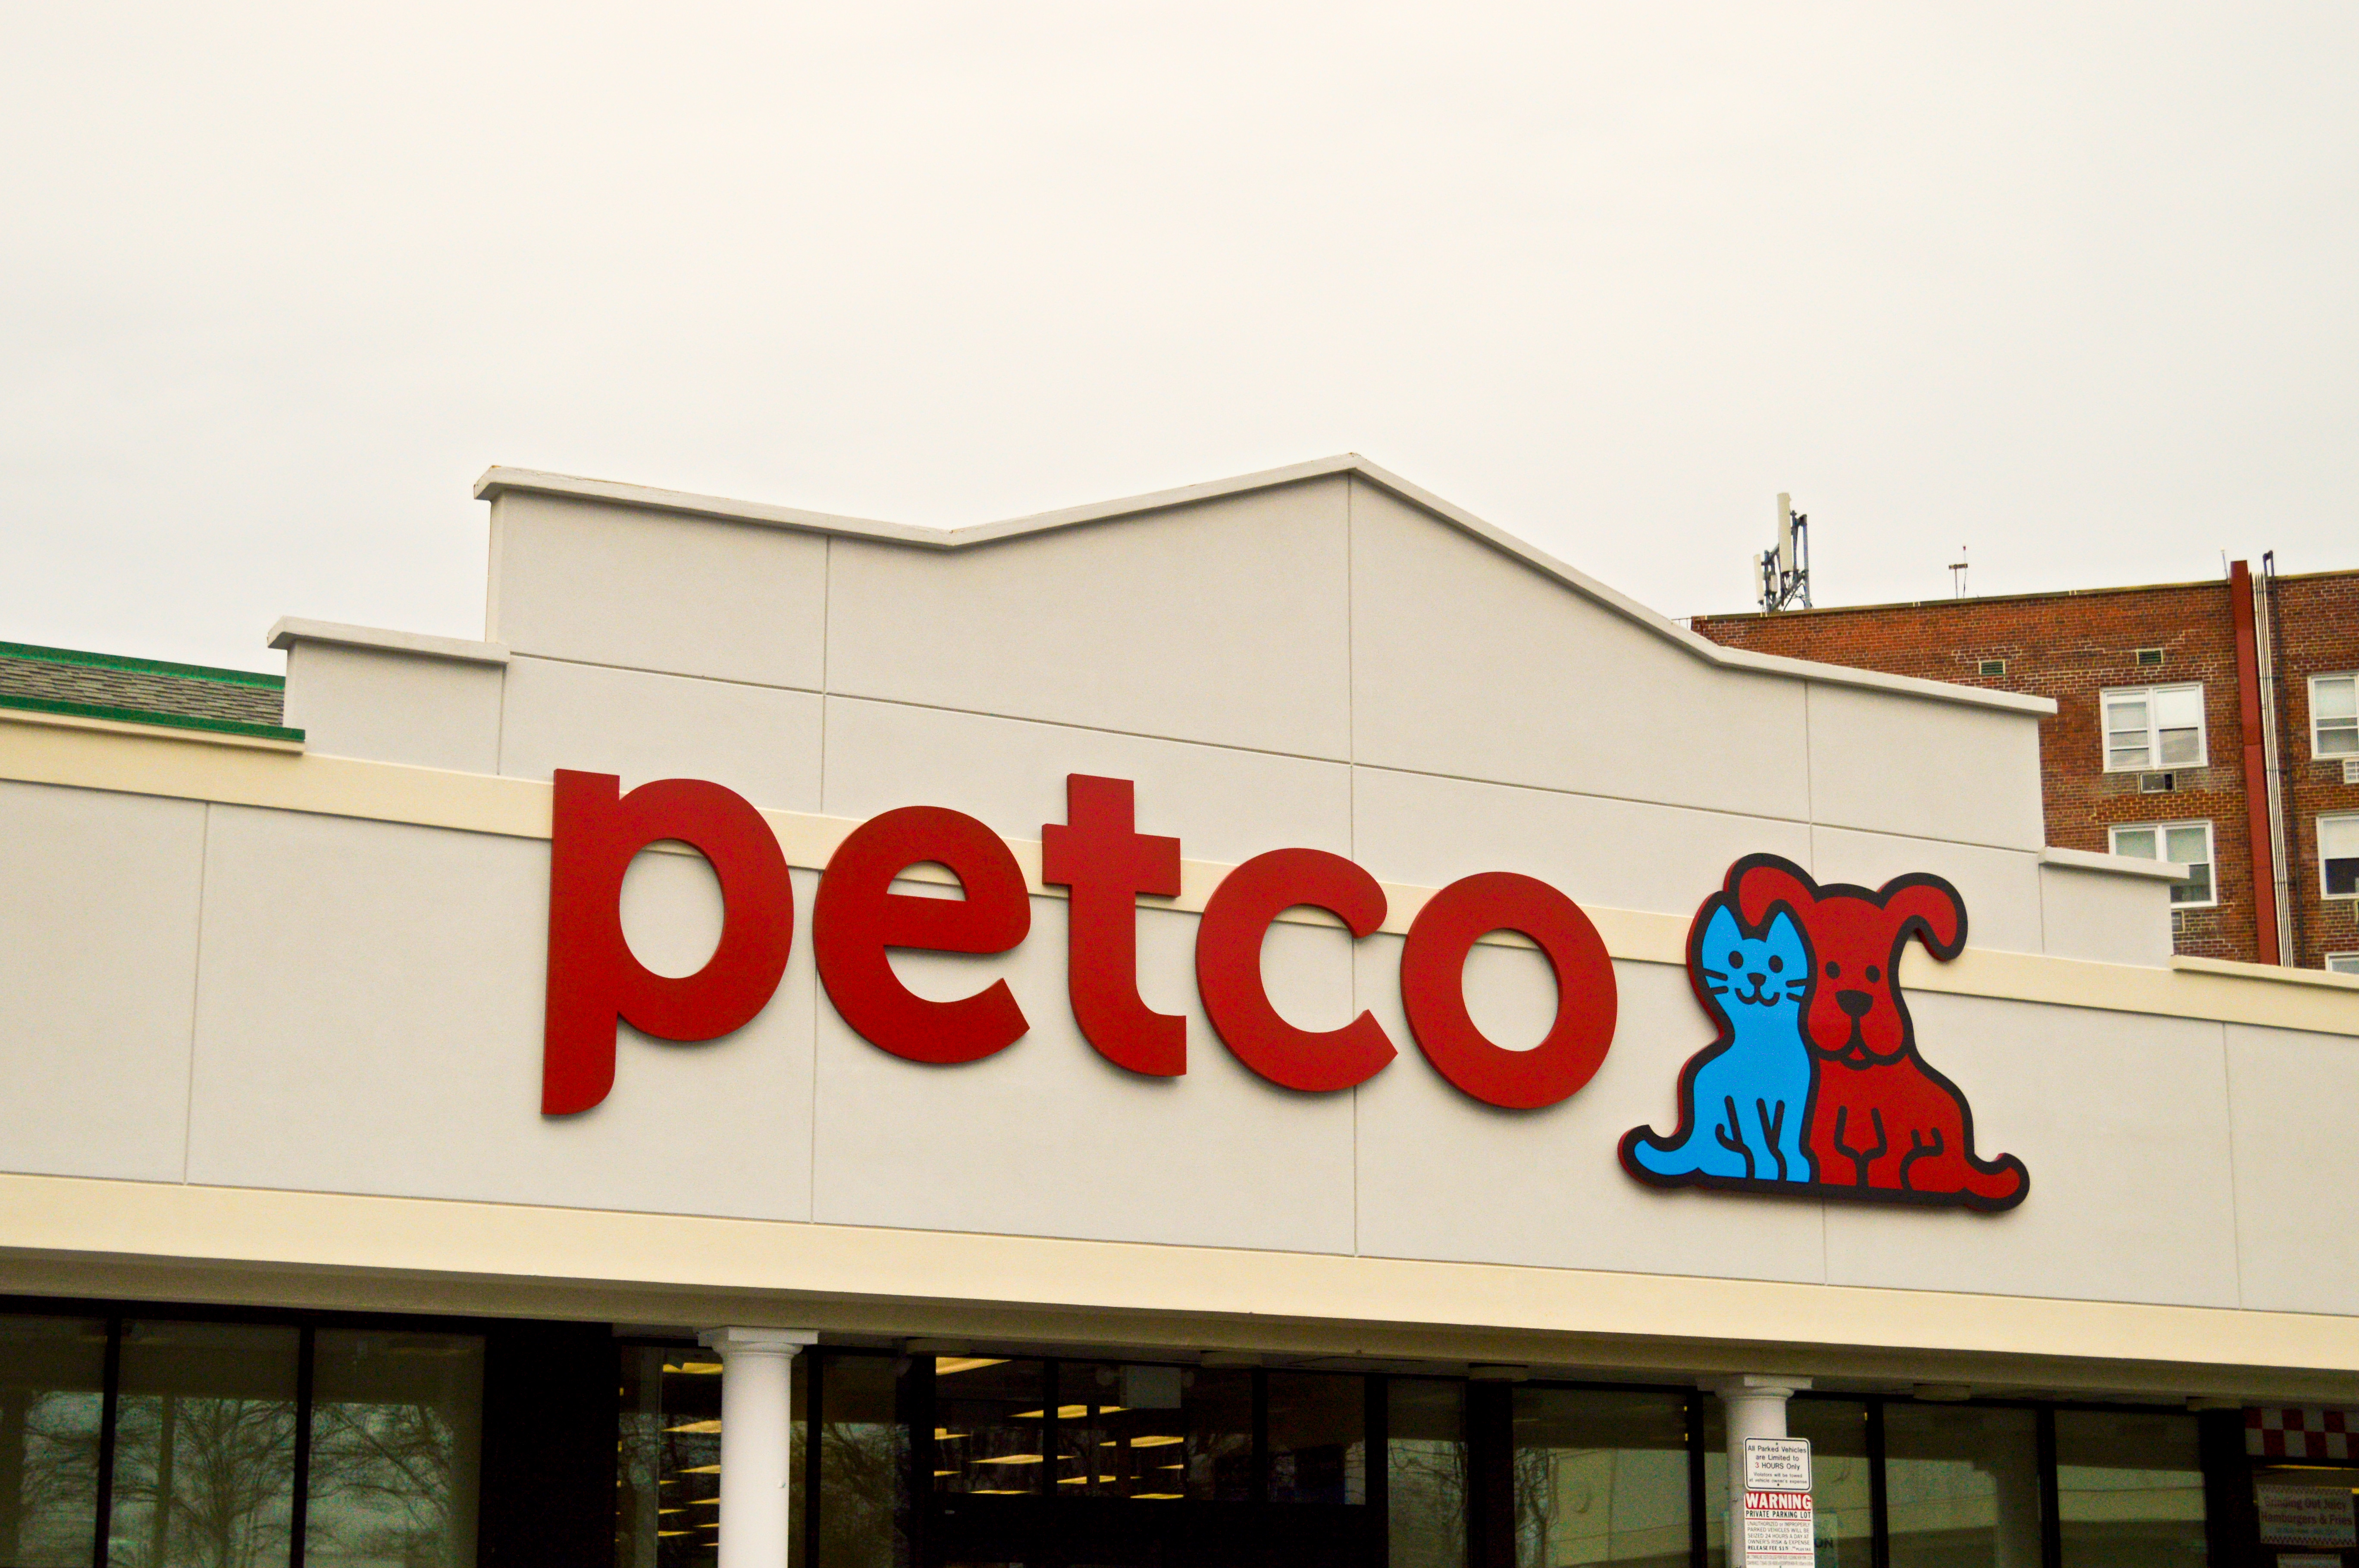 Petco - Hicksville, New York